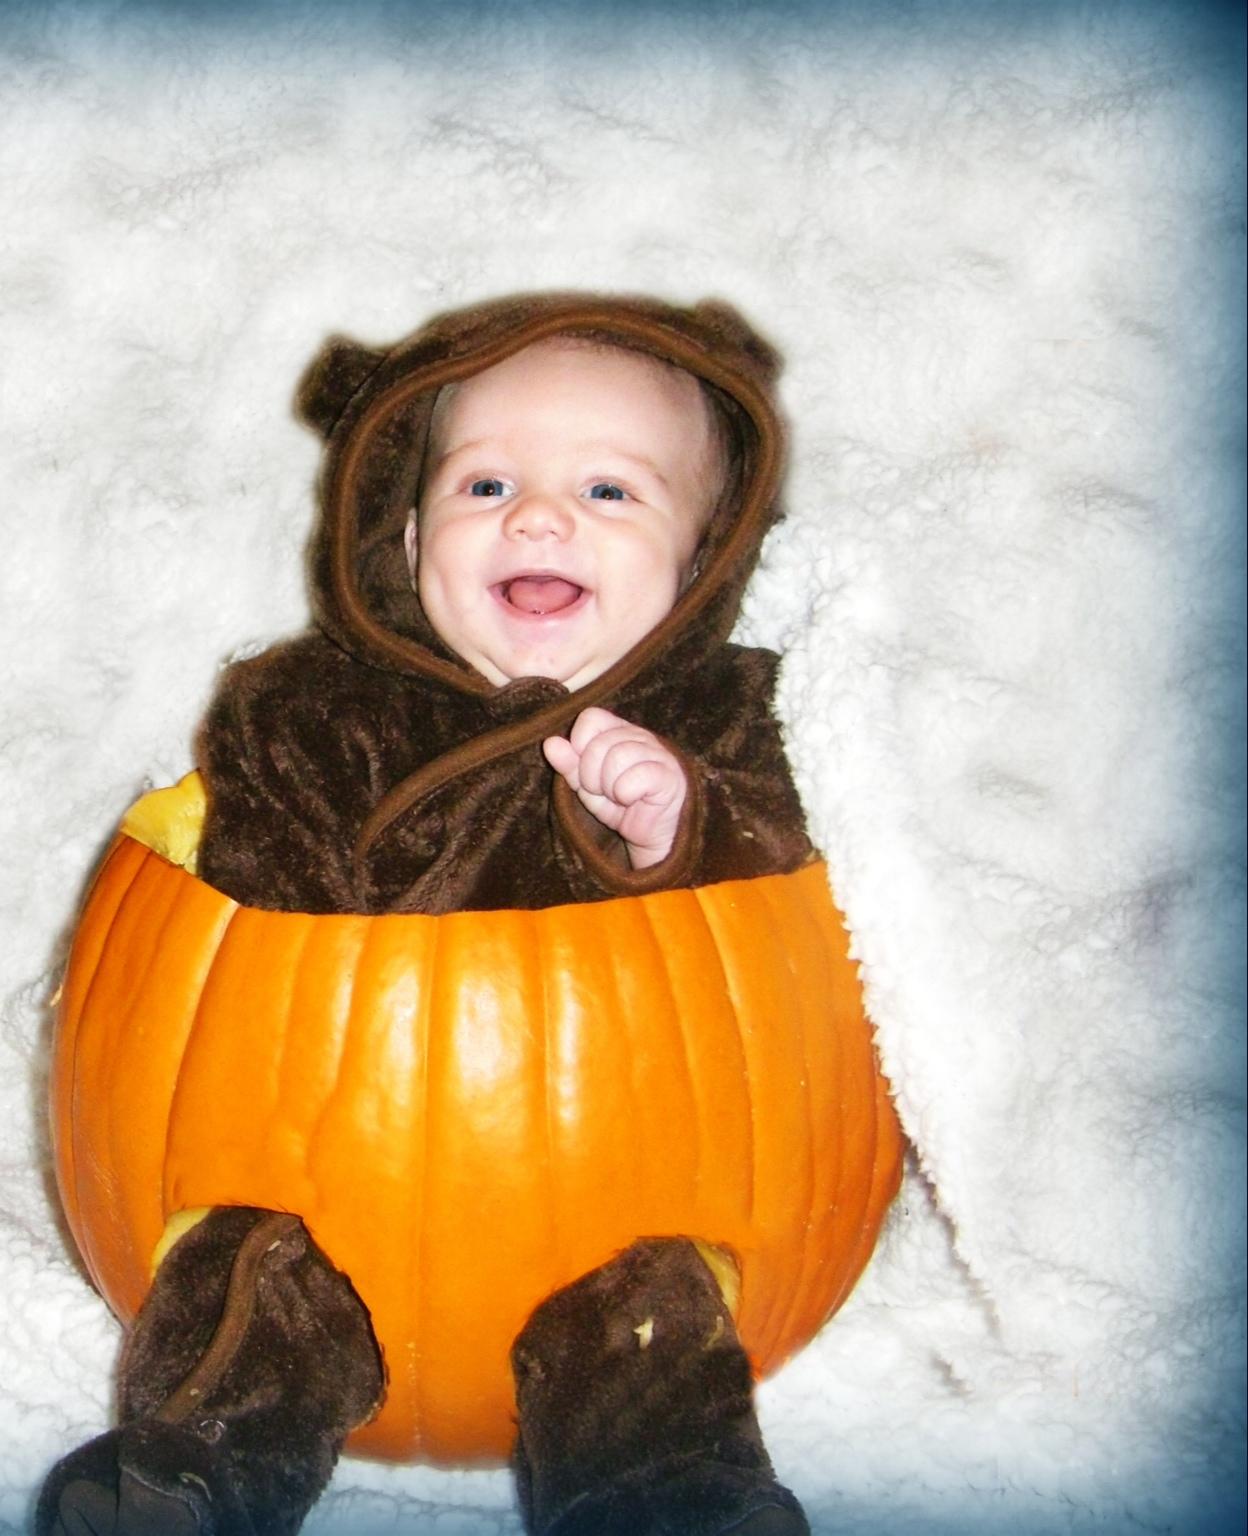 Alexa Rouae, 2 months old